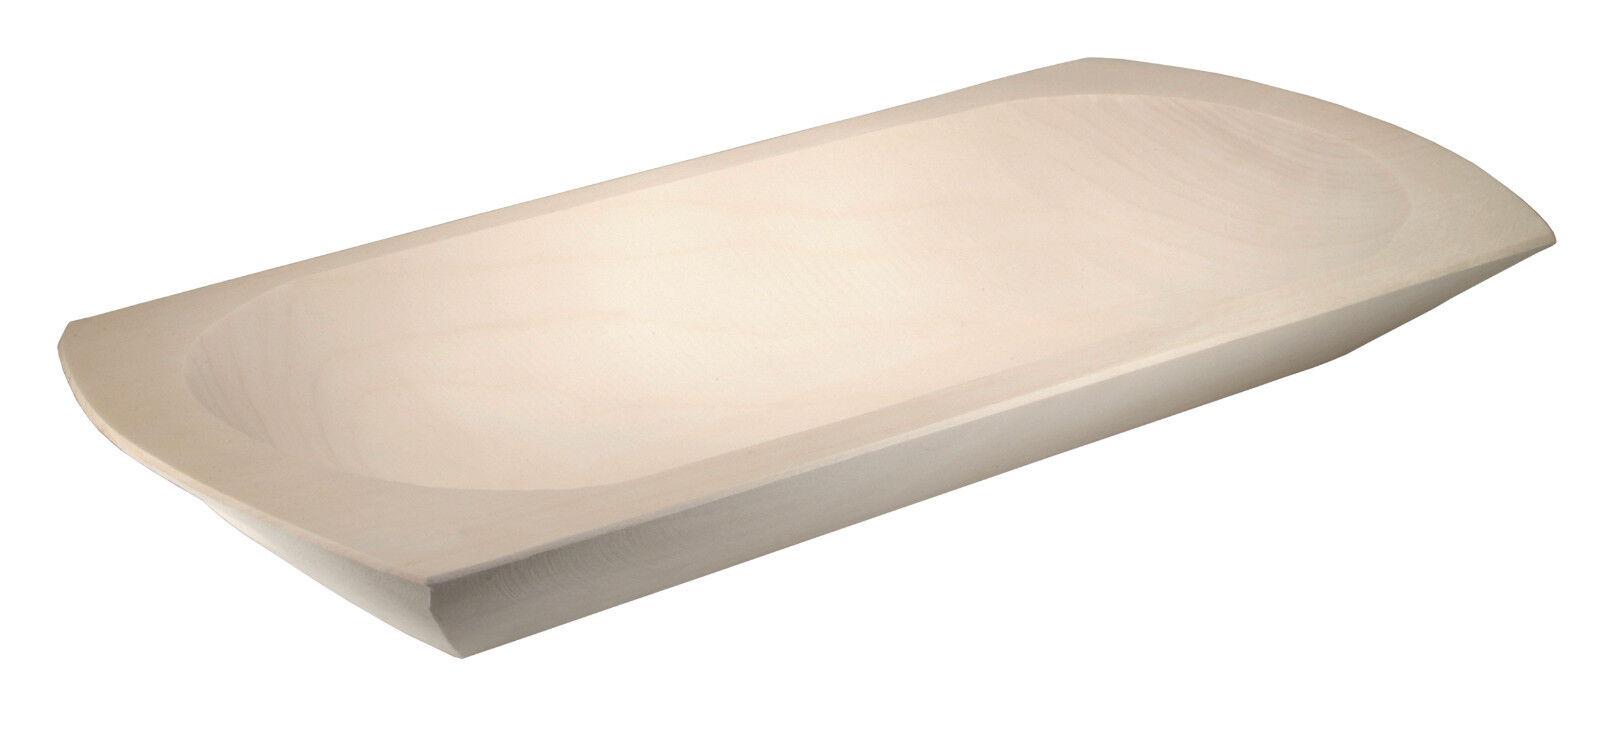 Schlachtemolle Holzmolle Mulle Molle Schale aus Espe 45 x 21 cm - ab